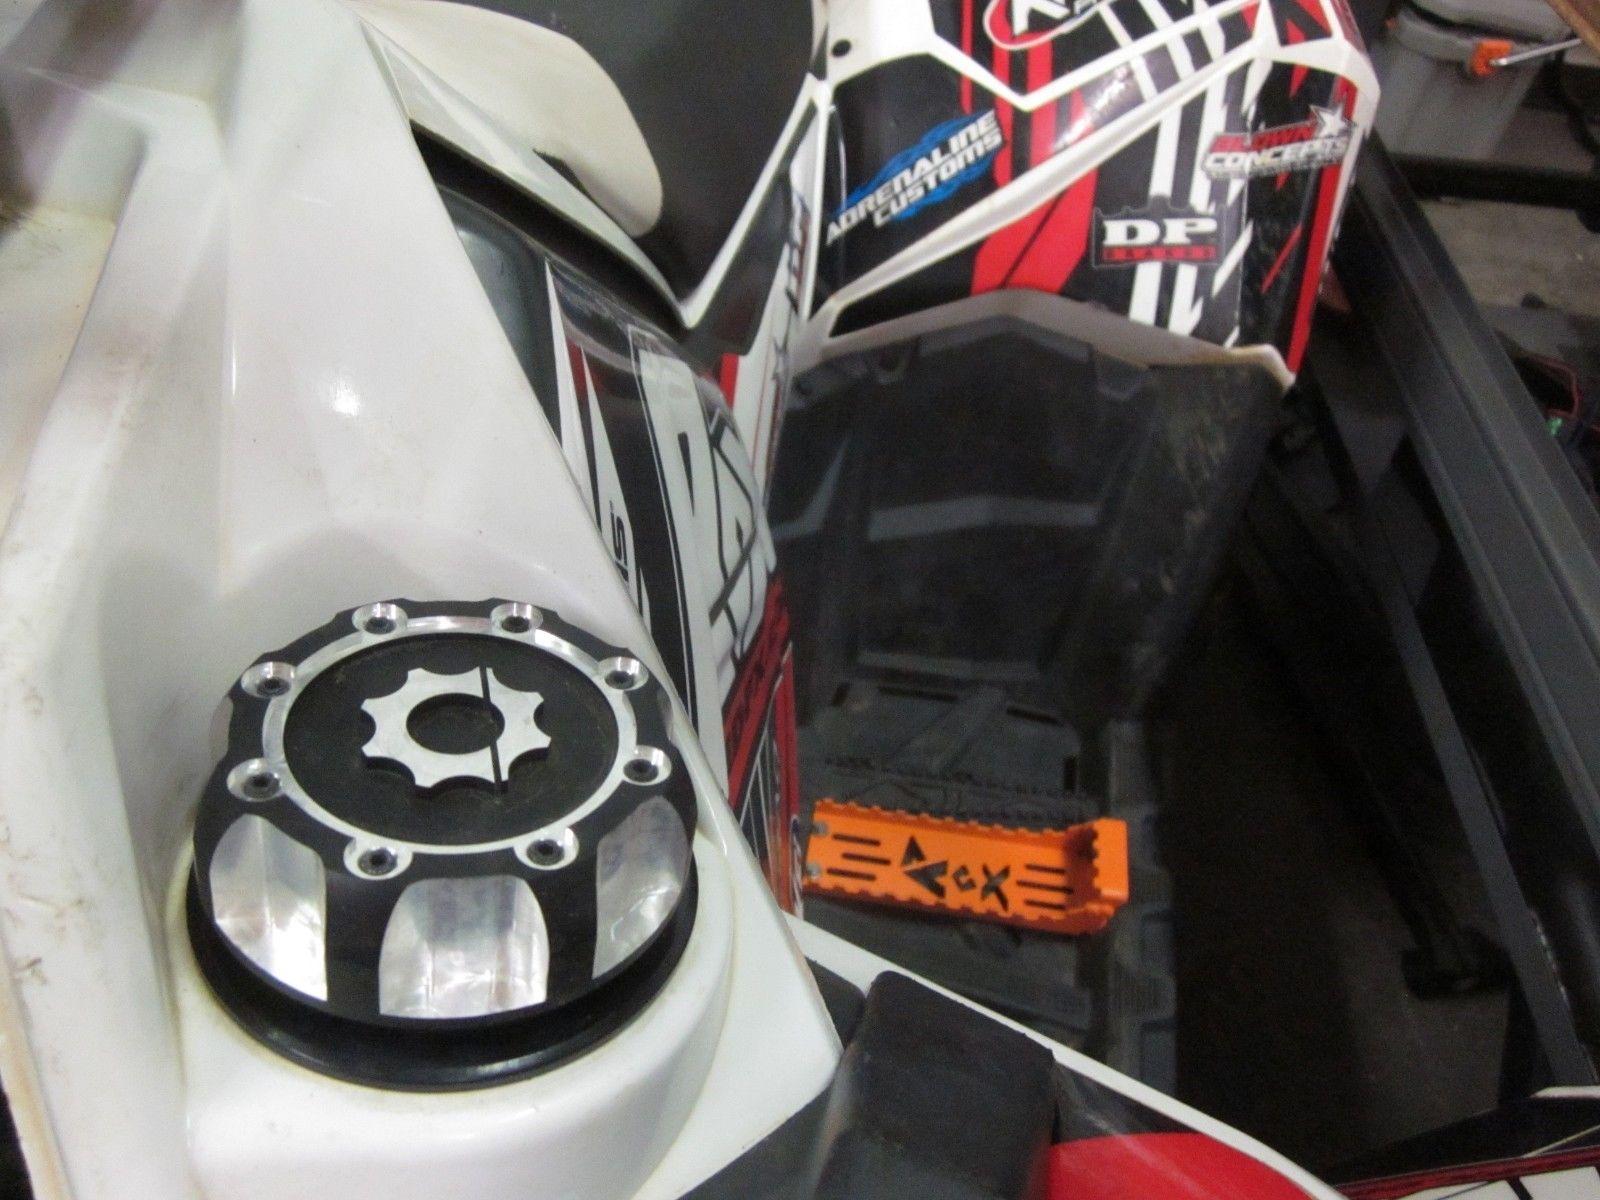 and 850 2x4 and 4x4 Polaris Sportsman 800 EFI 2005-2014 2015-2017 ATV Quad Billet Gas Cap Black